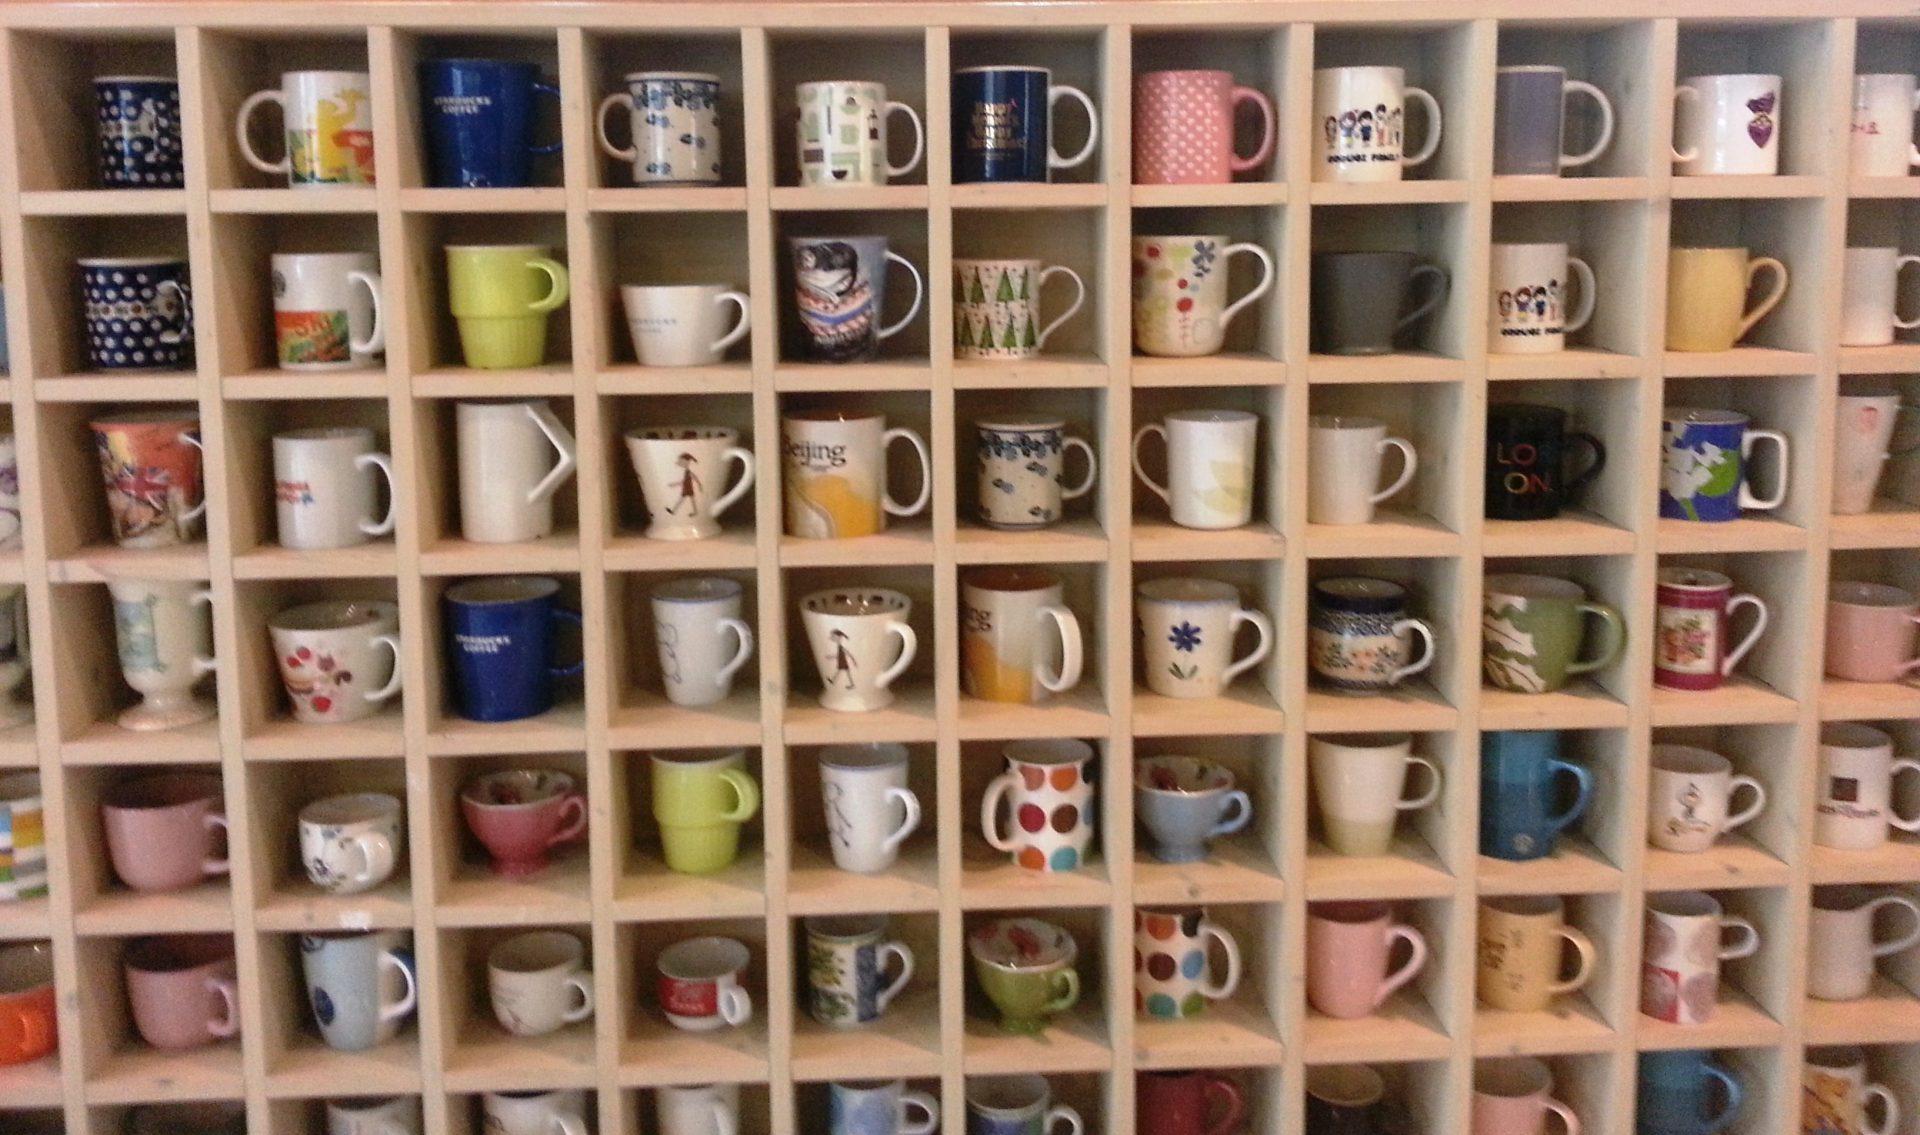 Fullsize Of Coffee Mug Collection